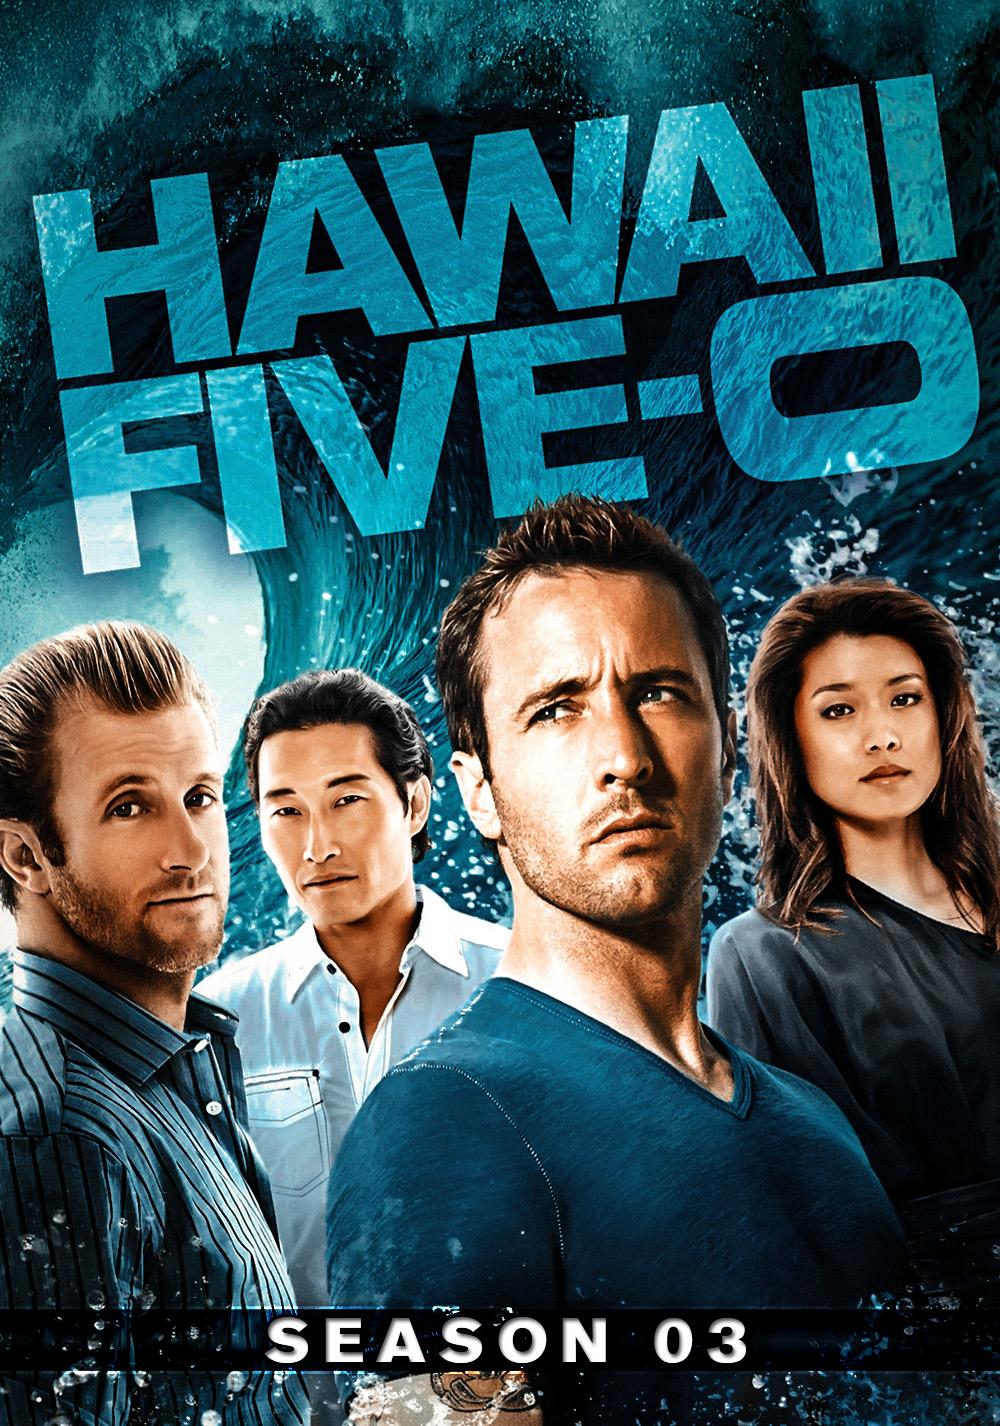 hawaii five o sendetermine